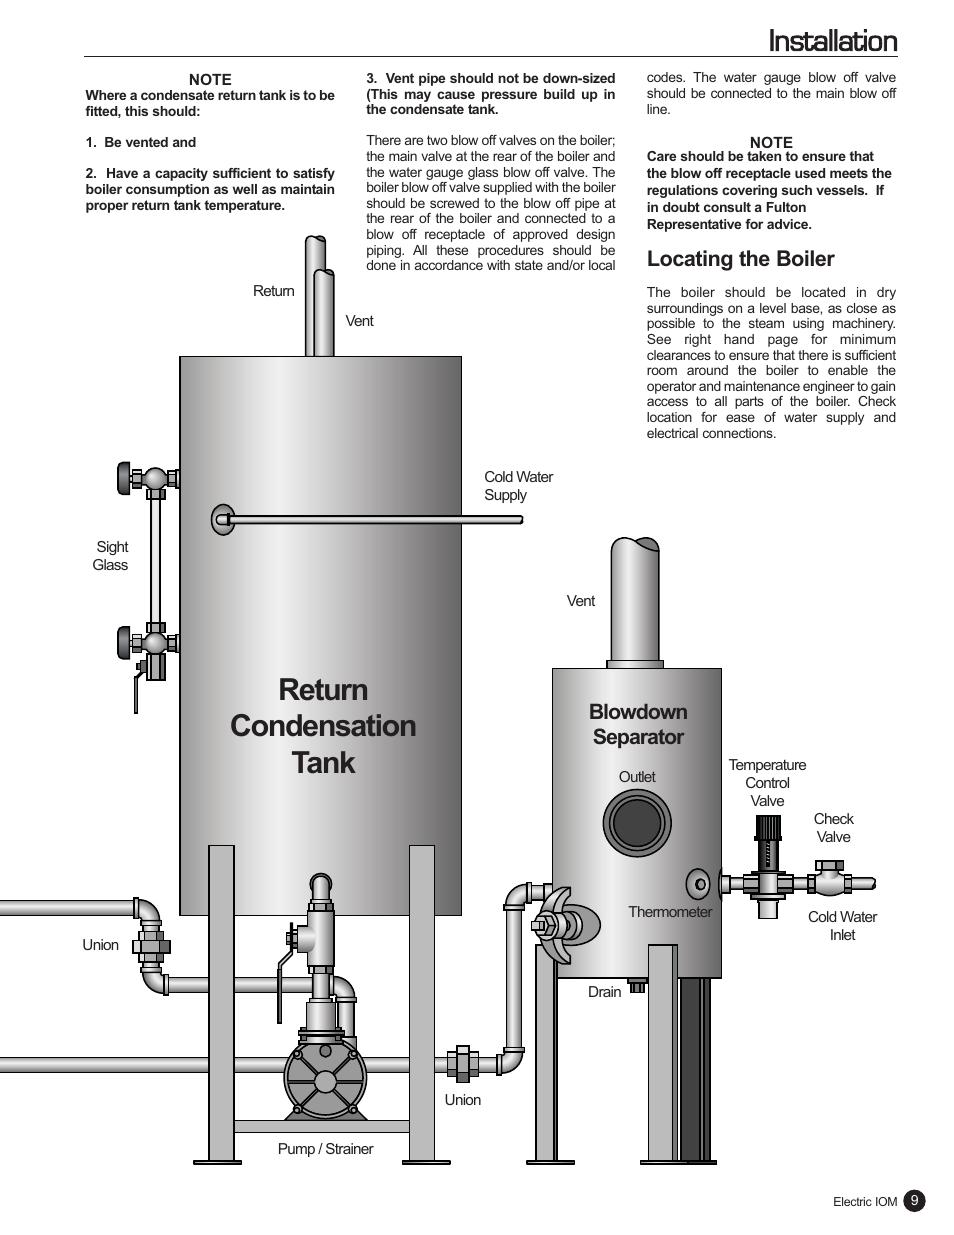 return condensation tank installation locating the boiler fulton rh manualsdir com  fulton electric steam boiler manual